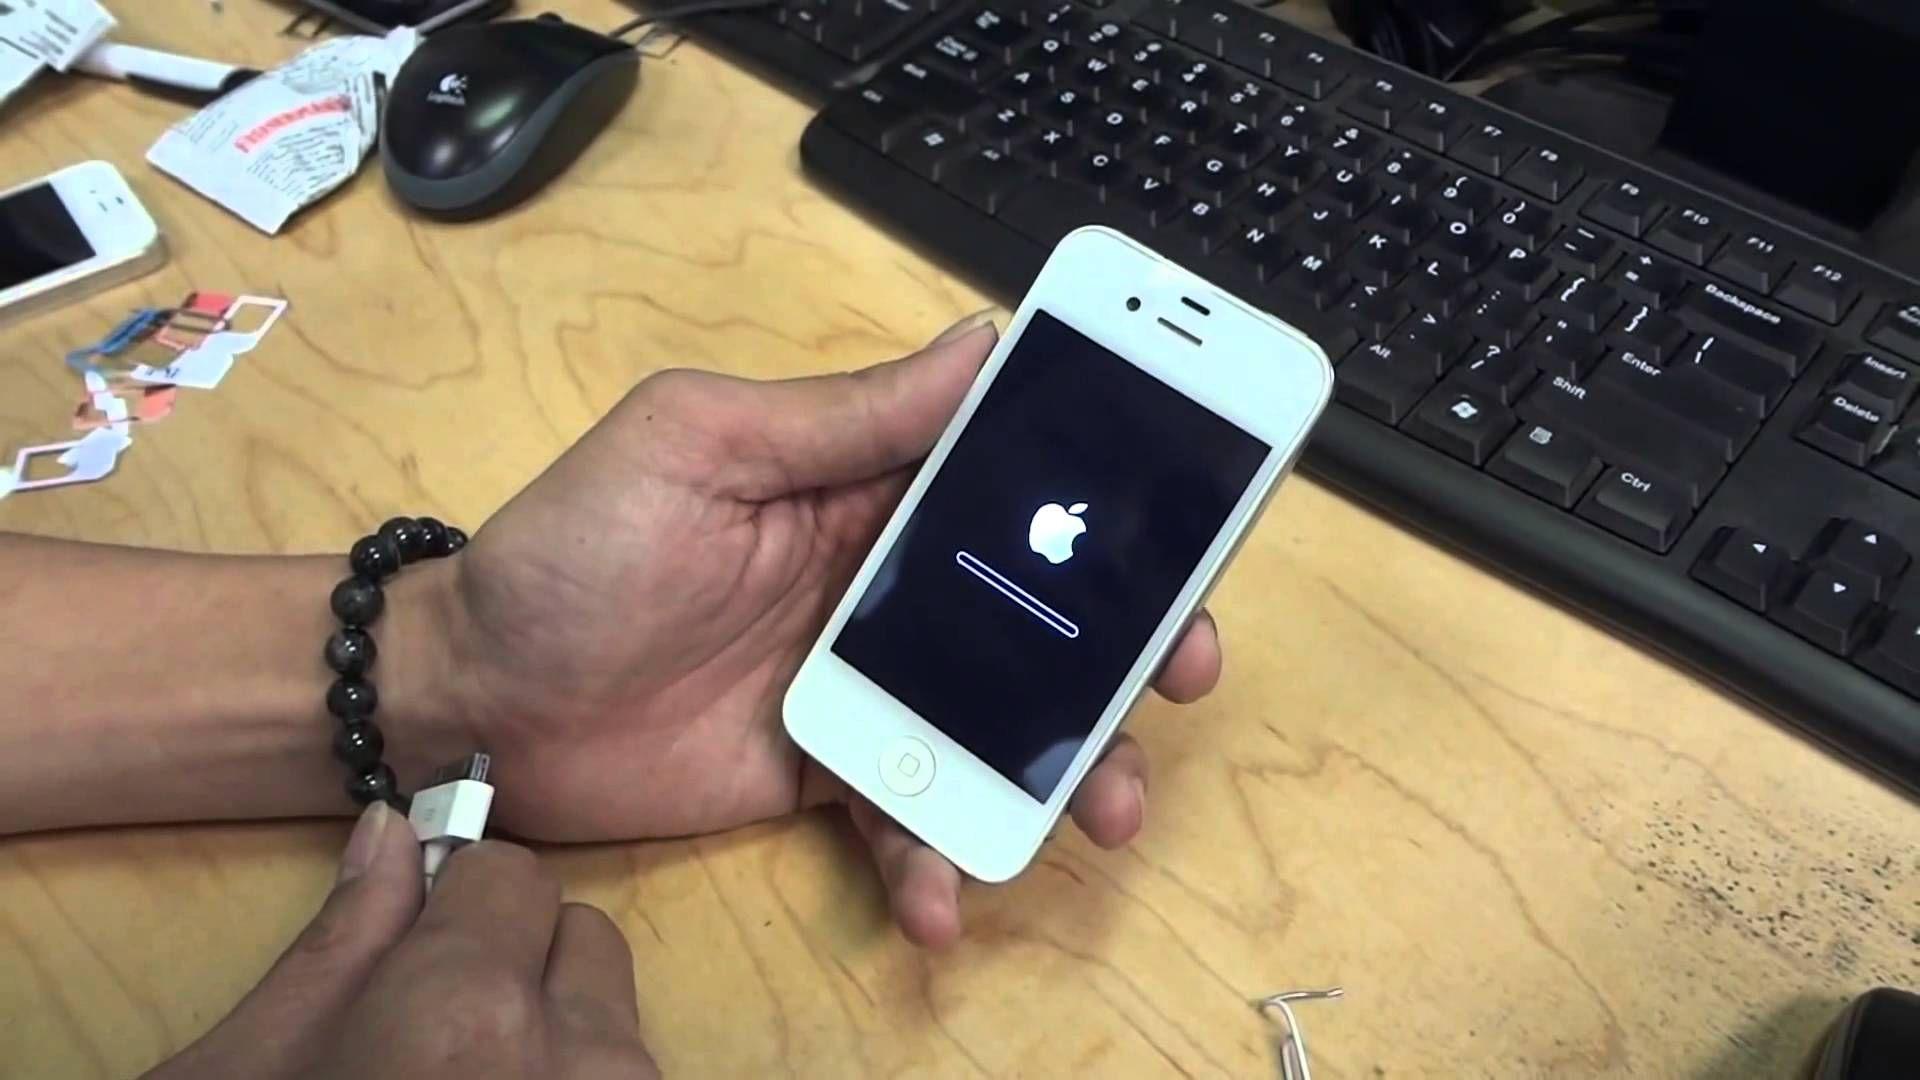 Free unlock iphone 6 6plus 5s 5c 5 4s 4 3gs any ios